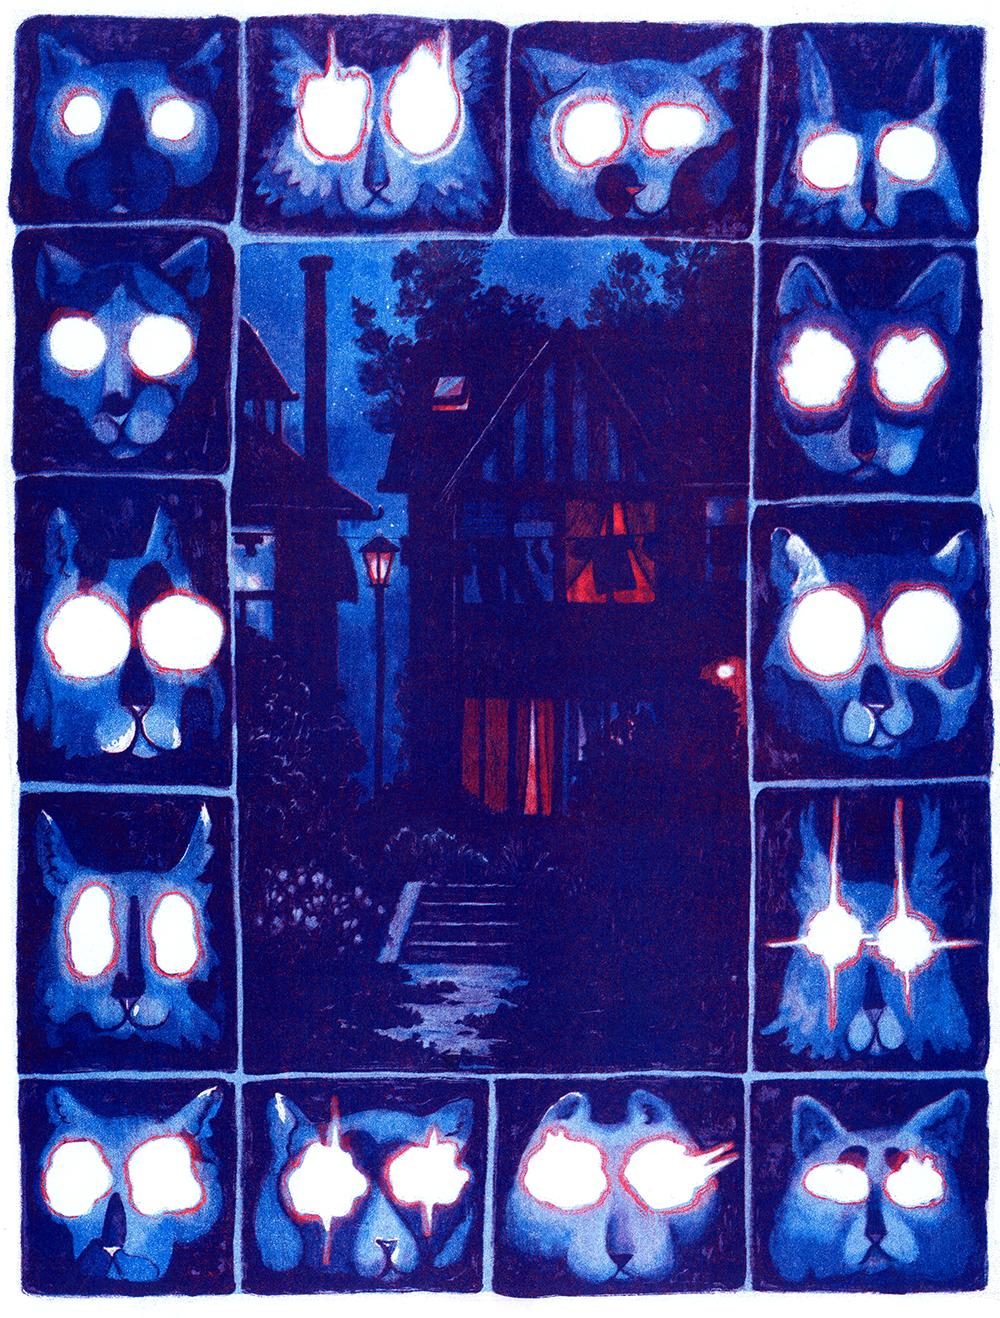 Lights on Bain. 11x17. 3 Colour Risograph. $20 + Shipping